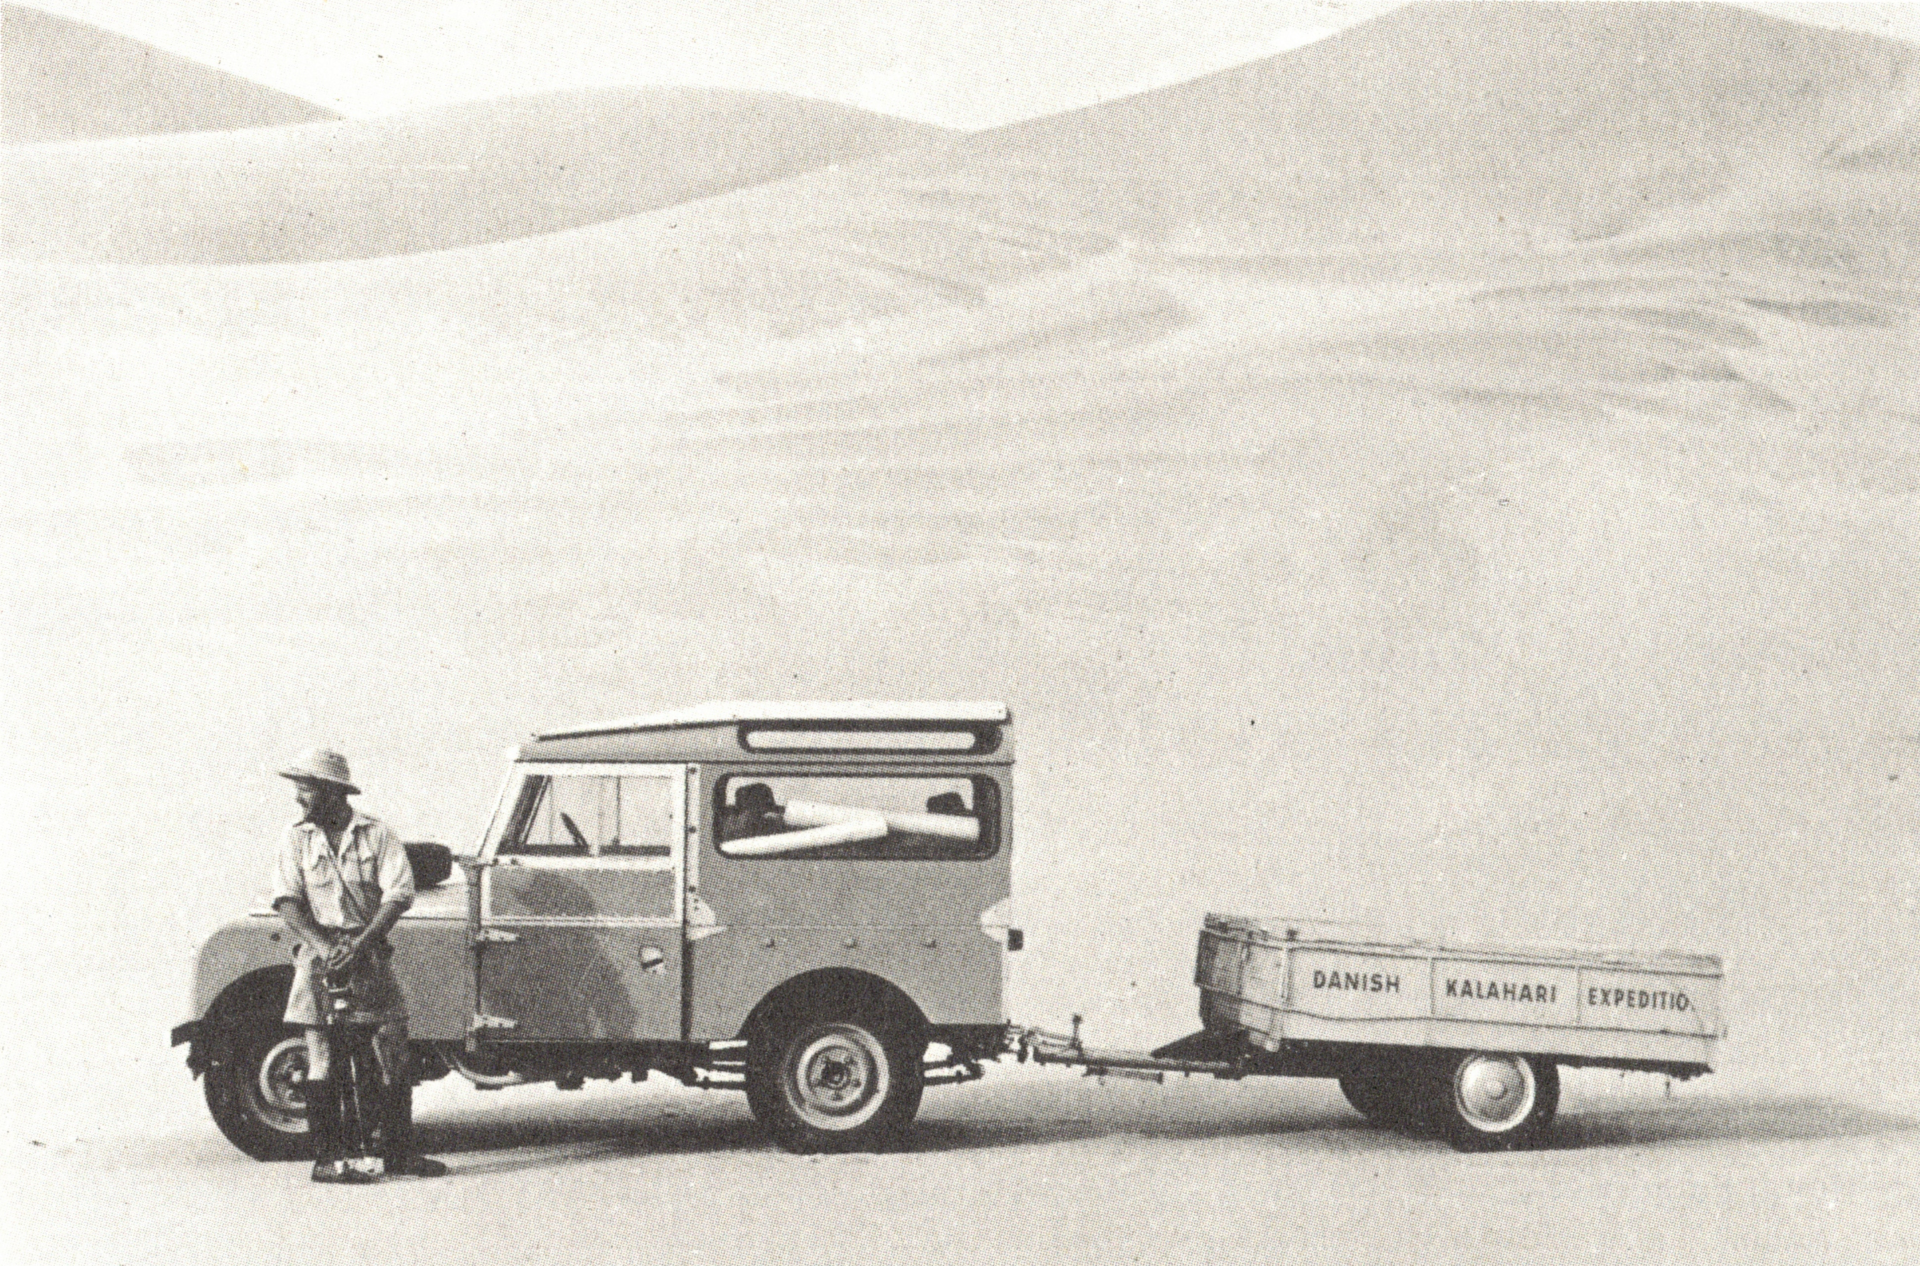 Danish Kalahari Expedition - Jens Bjerre på vej til San-folket i Kalahariørkenen i Sydvestafrika. Privatfoto.